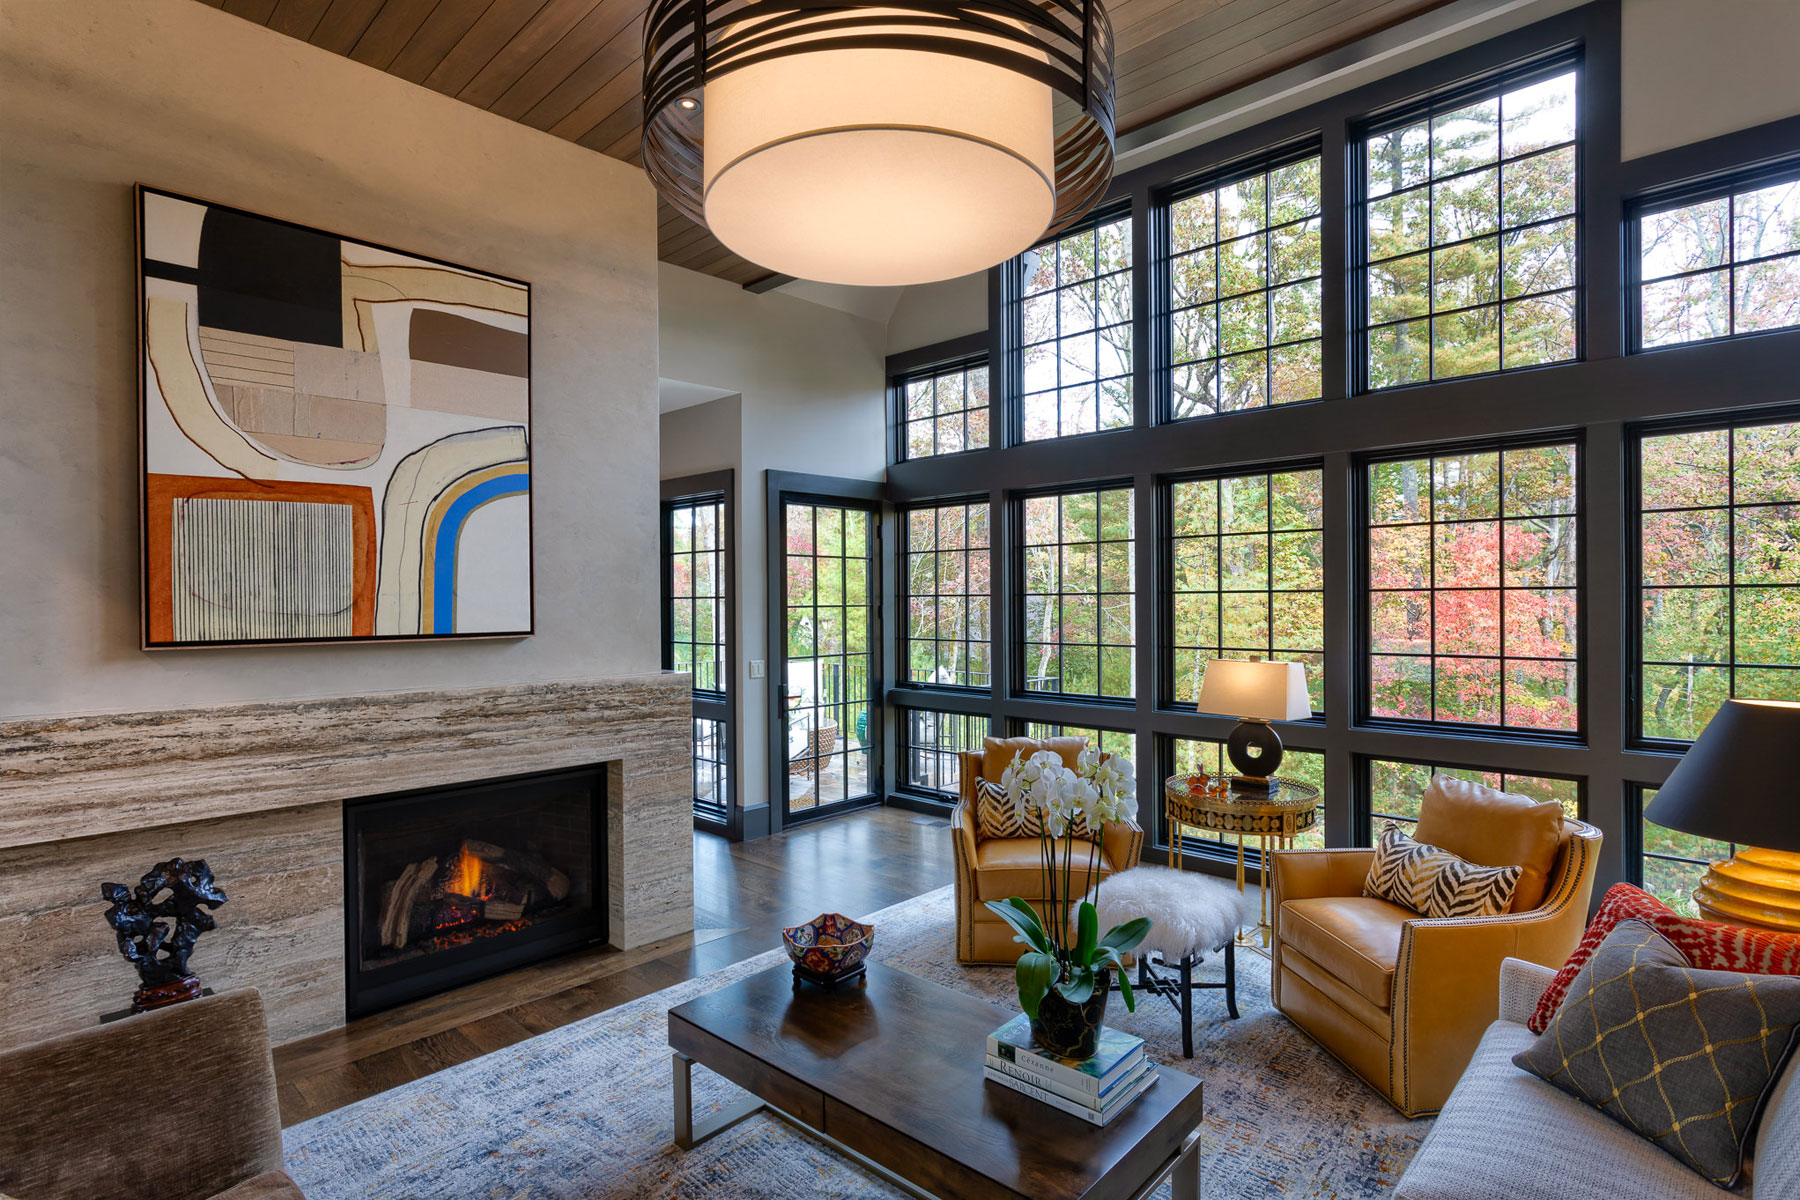 Interior design of modern eclectic luxury living room